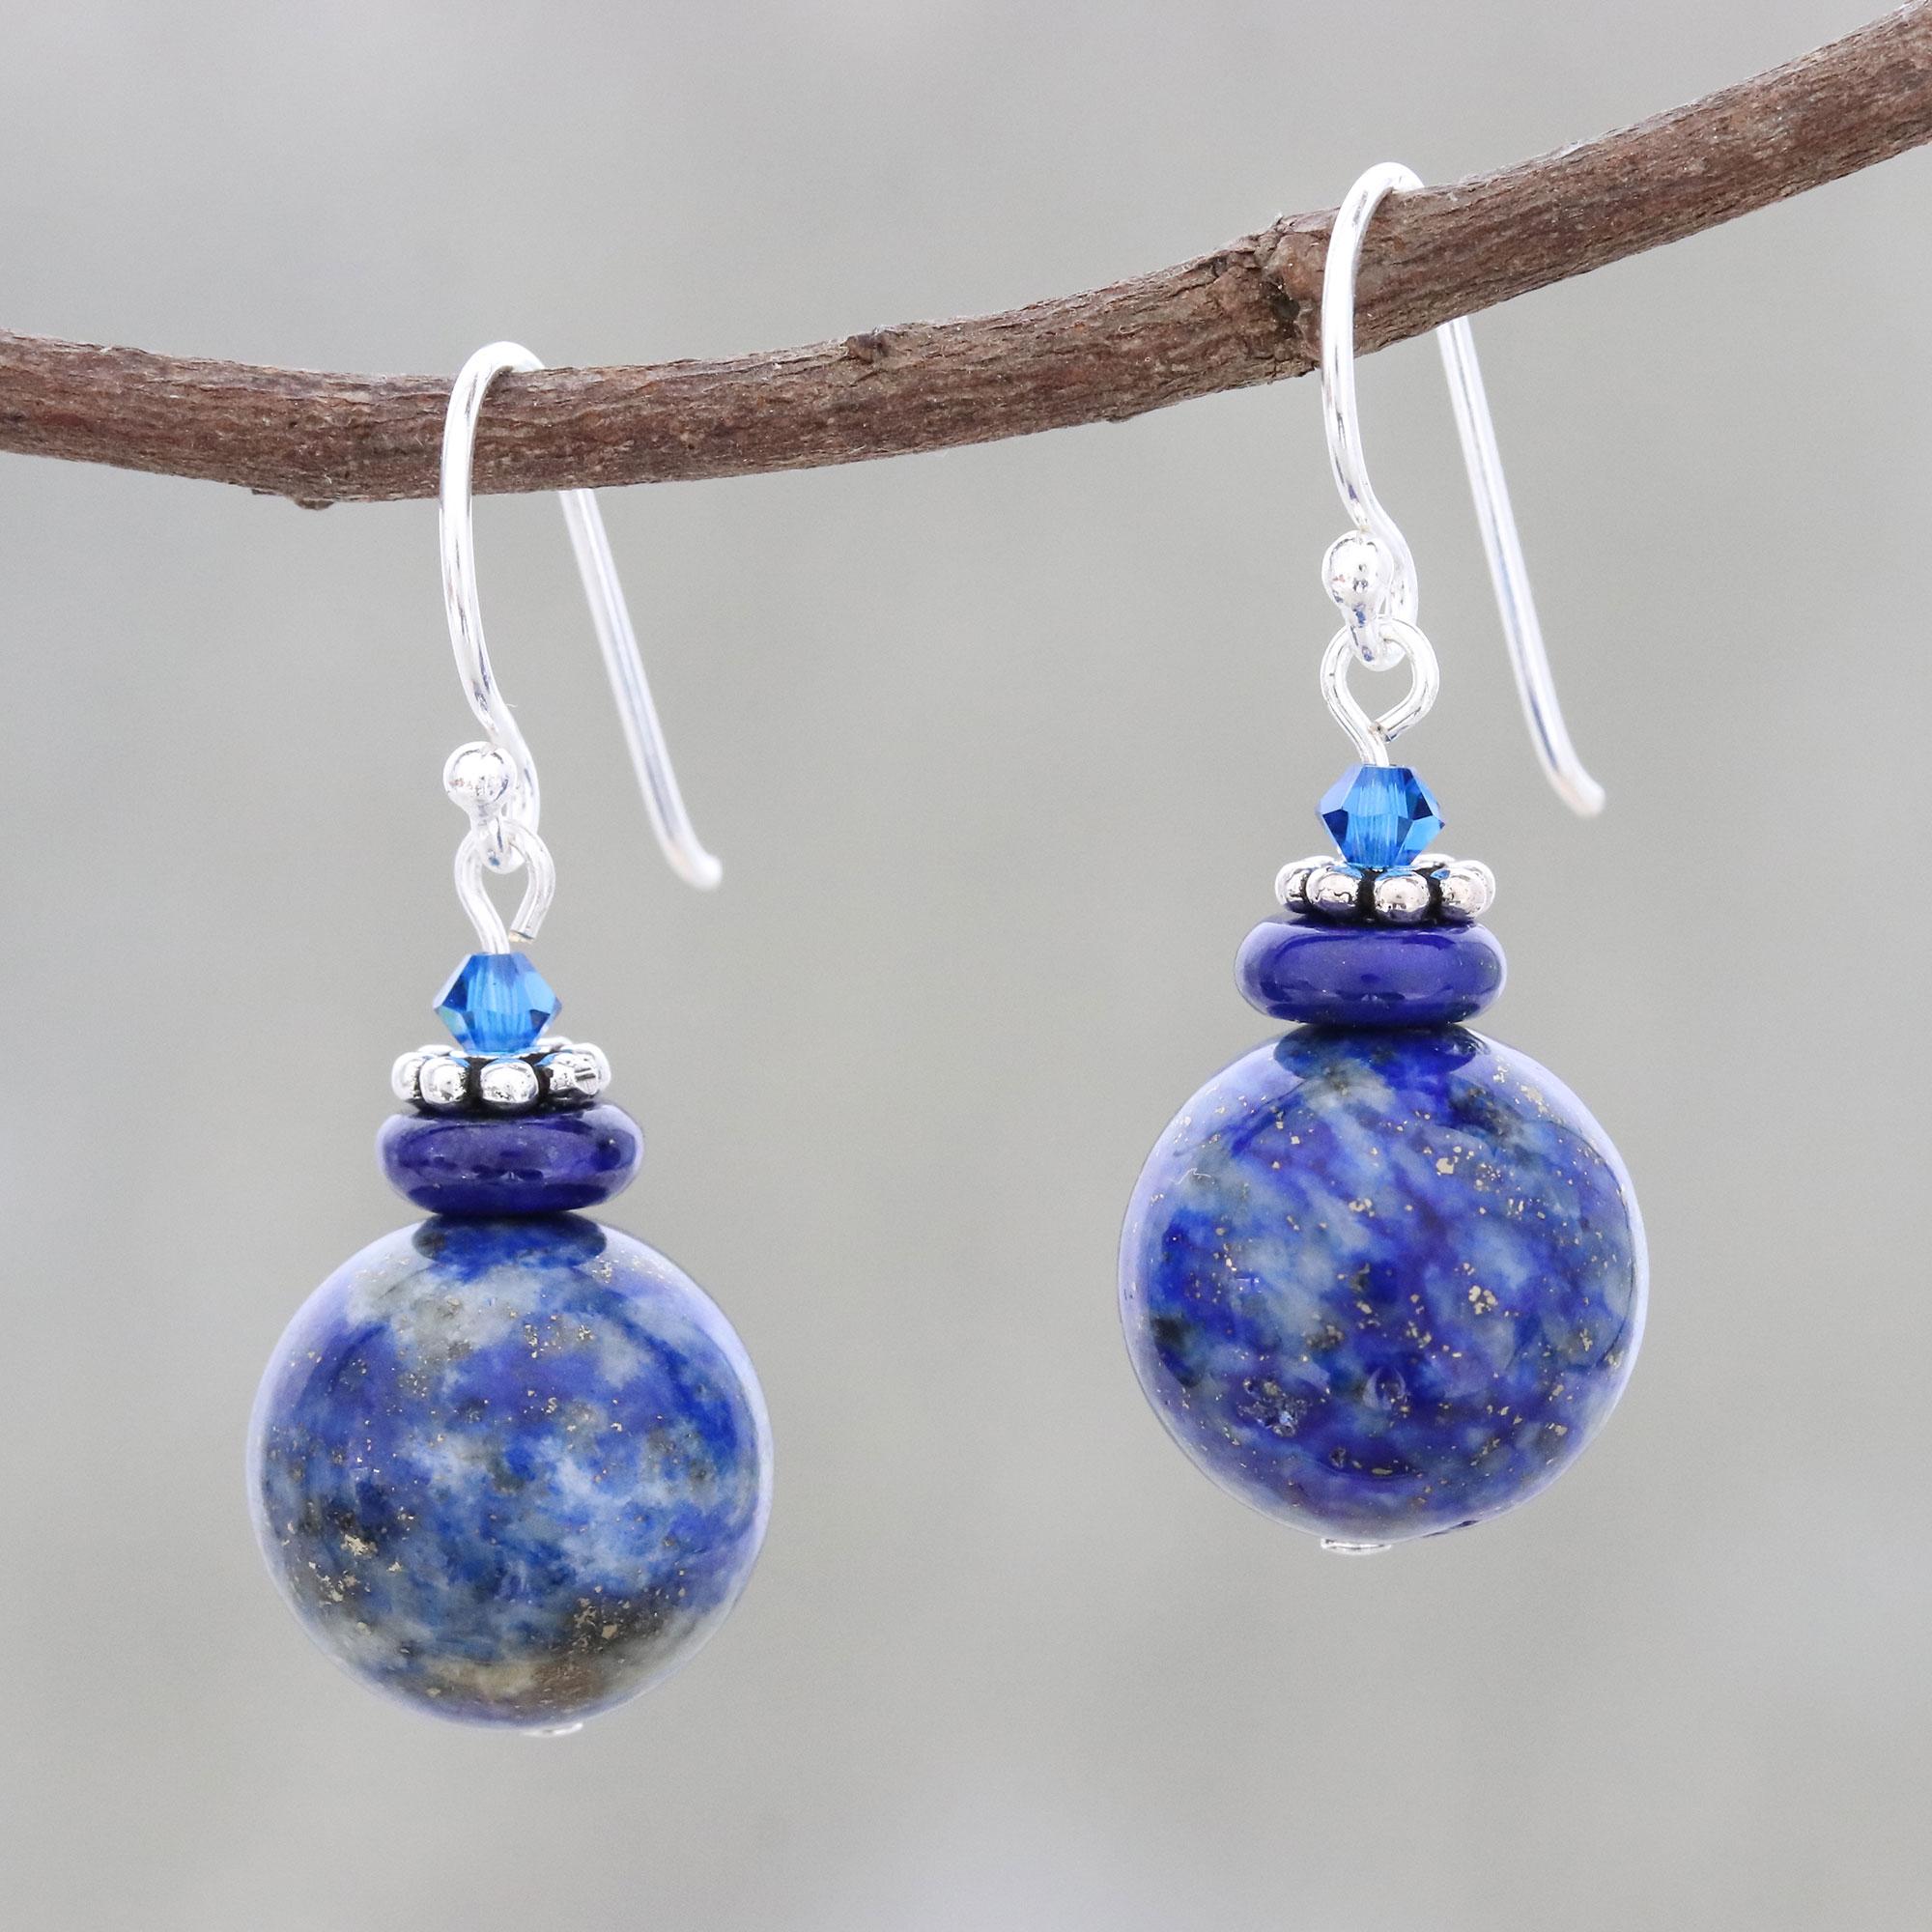 a4e7f1068 Lapis Lazuli Beaded Dangle Earrings from Thailand - Global Wonder ...